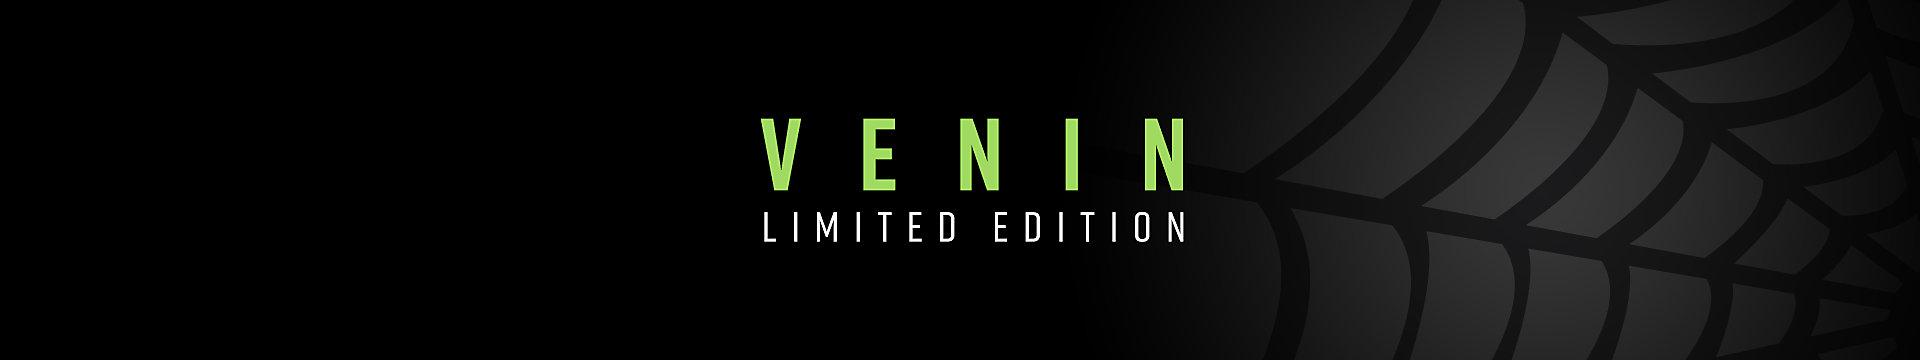 Fox Heritage Venin Limited Edition